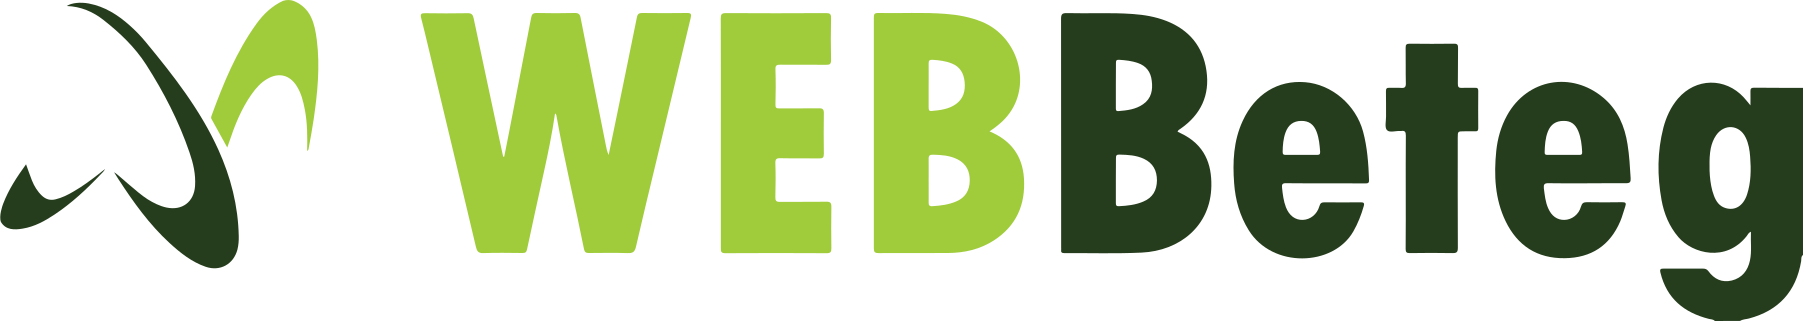 wb_logo2_small-1.png